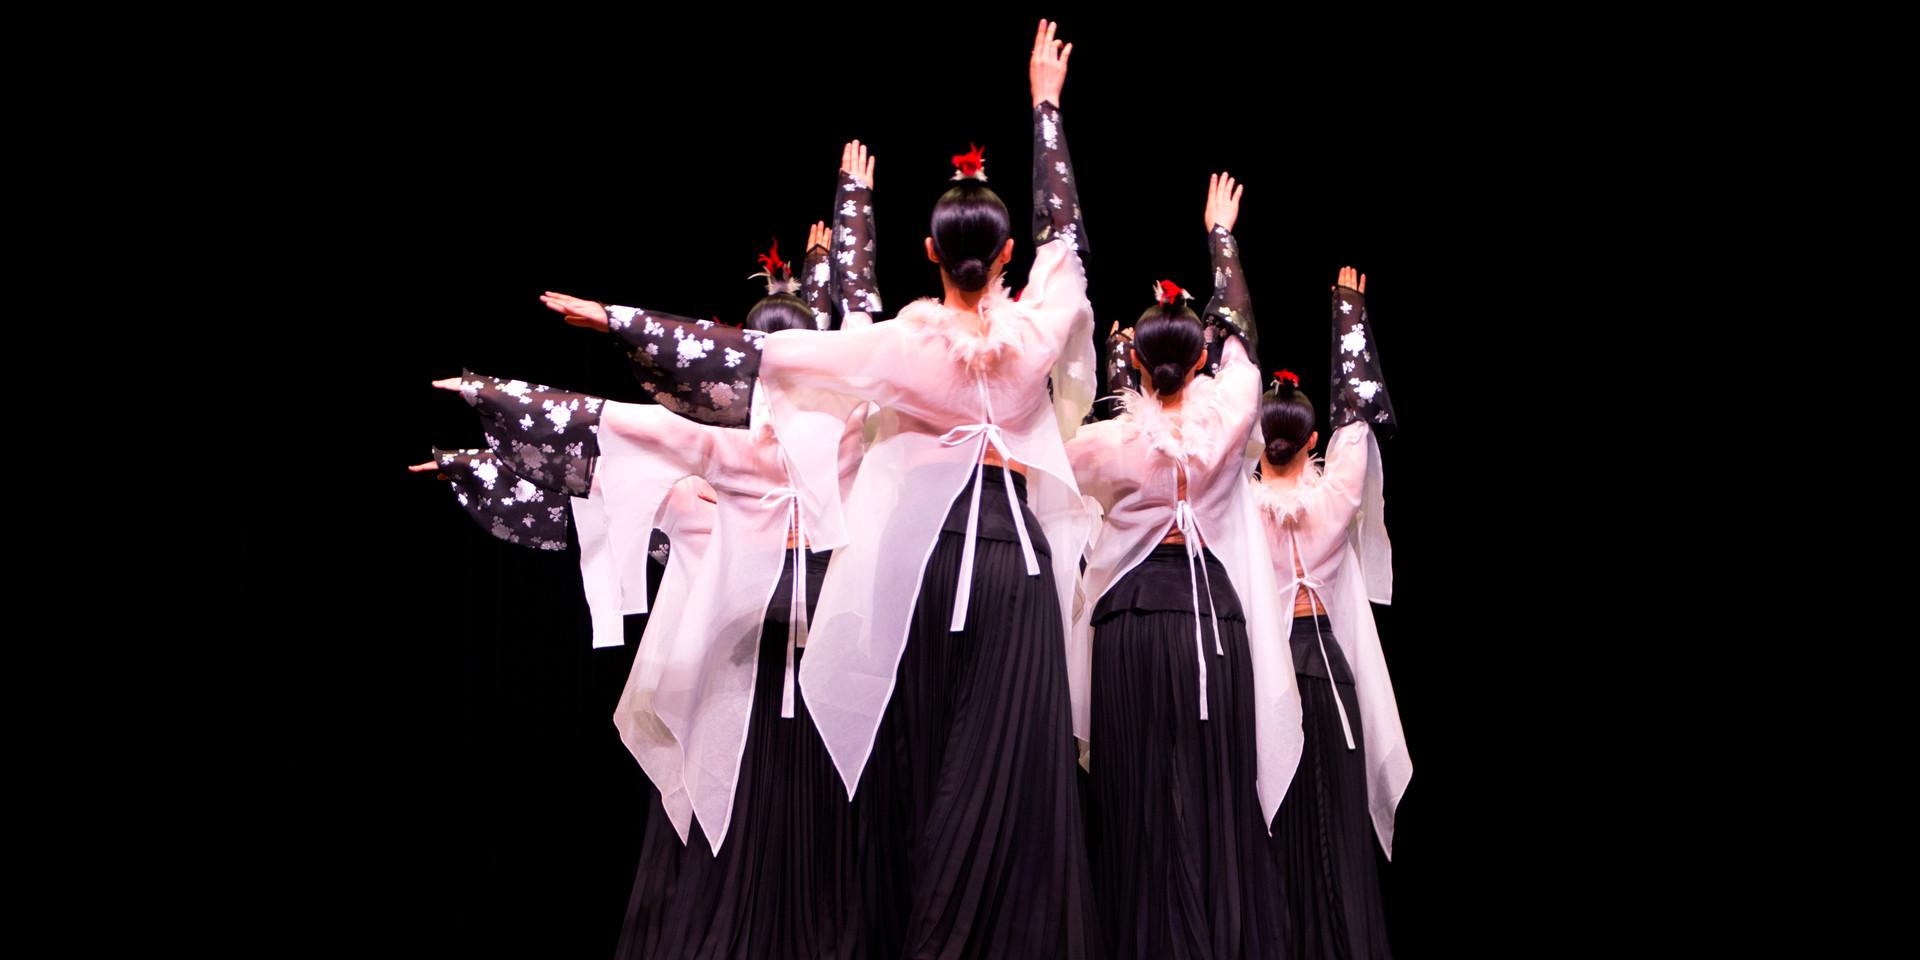 Gangwon Provincial Dance(2019.5.25)